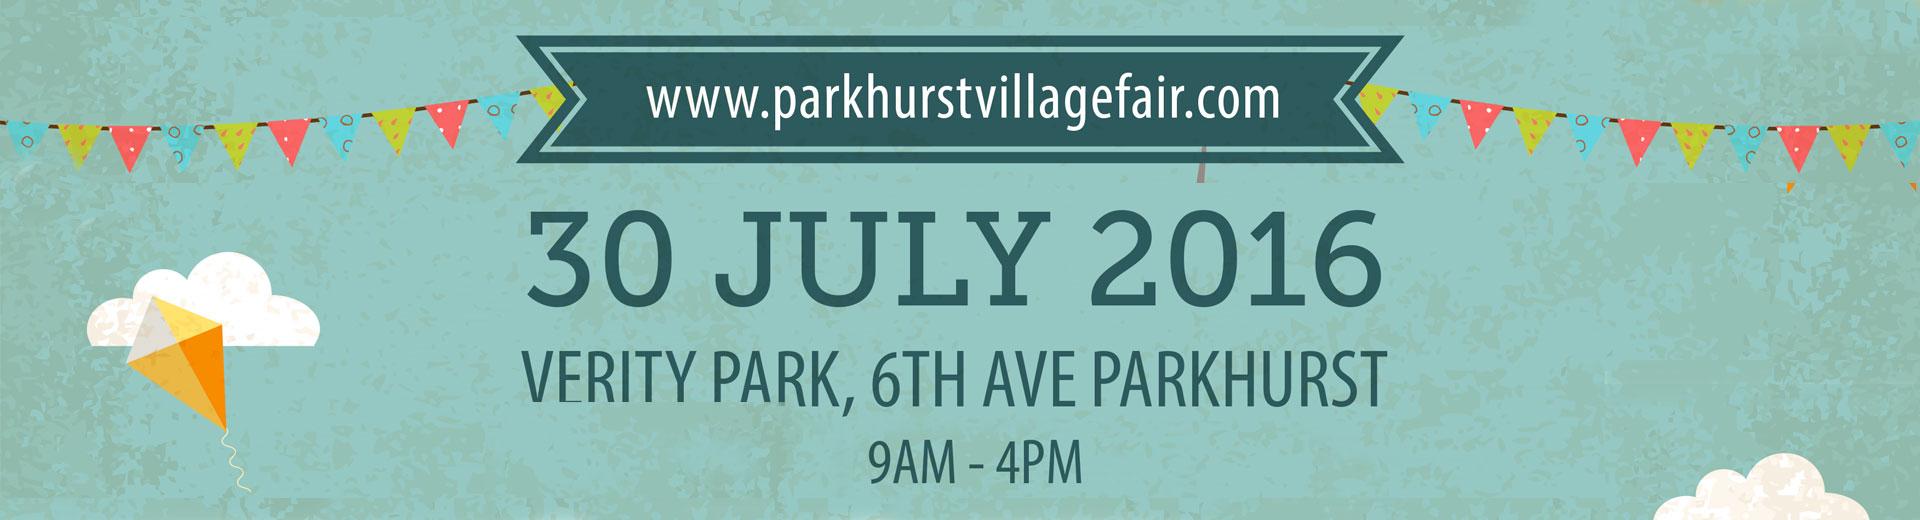 http://parkhurstvillagefair.com/wp-content/uploads/2016/03/homepage-header.jpg